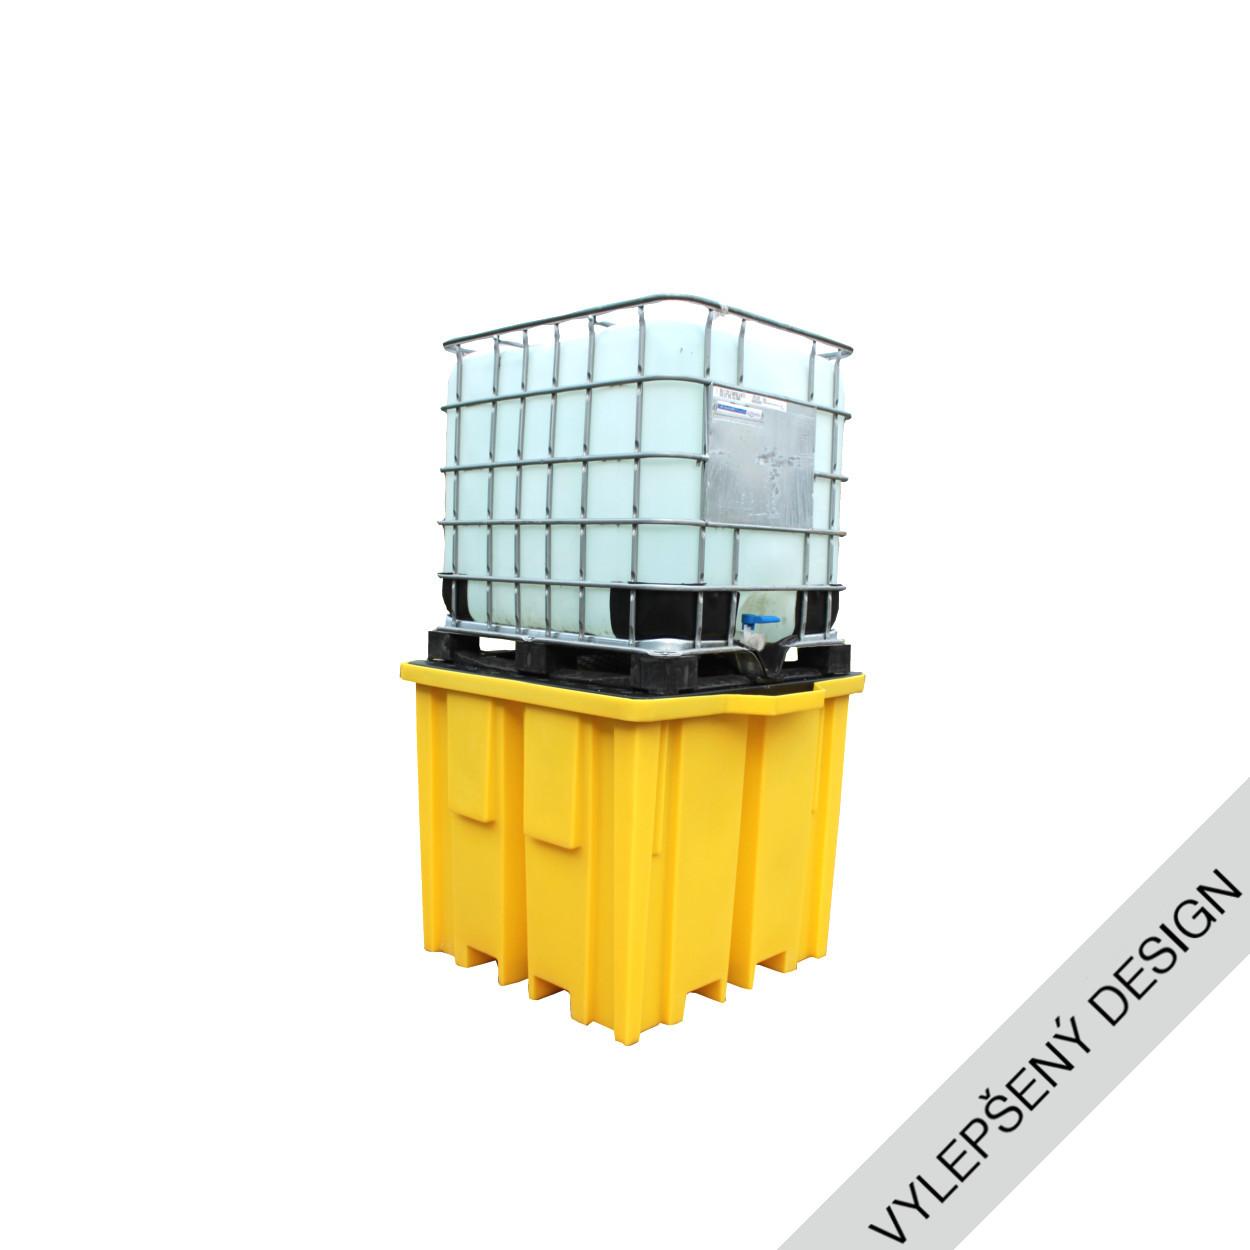 Záchytná vana s roštem pod IBC kontejner